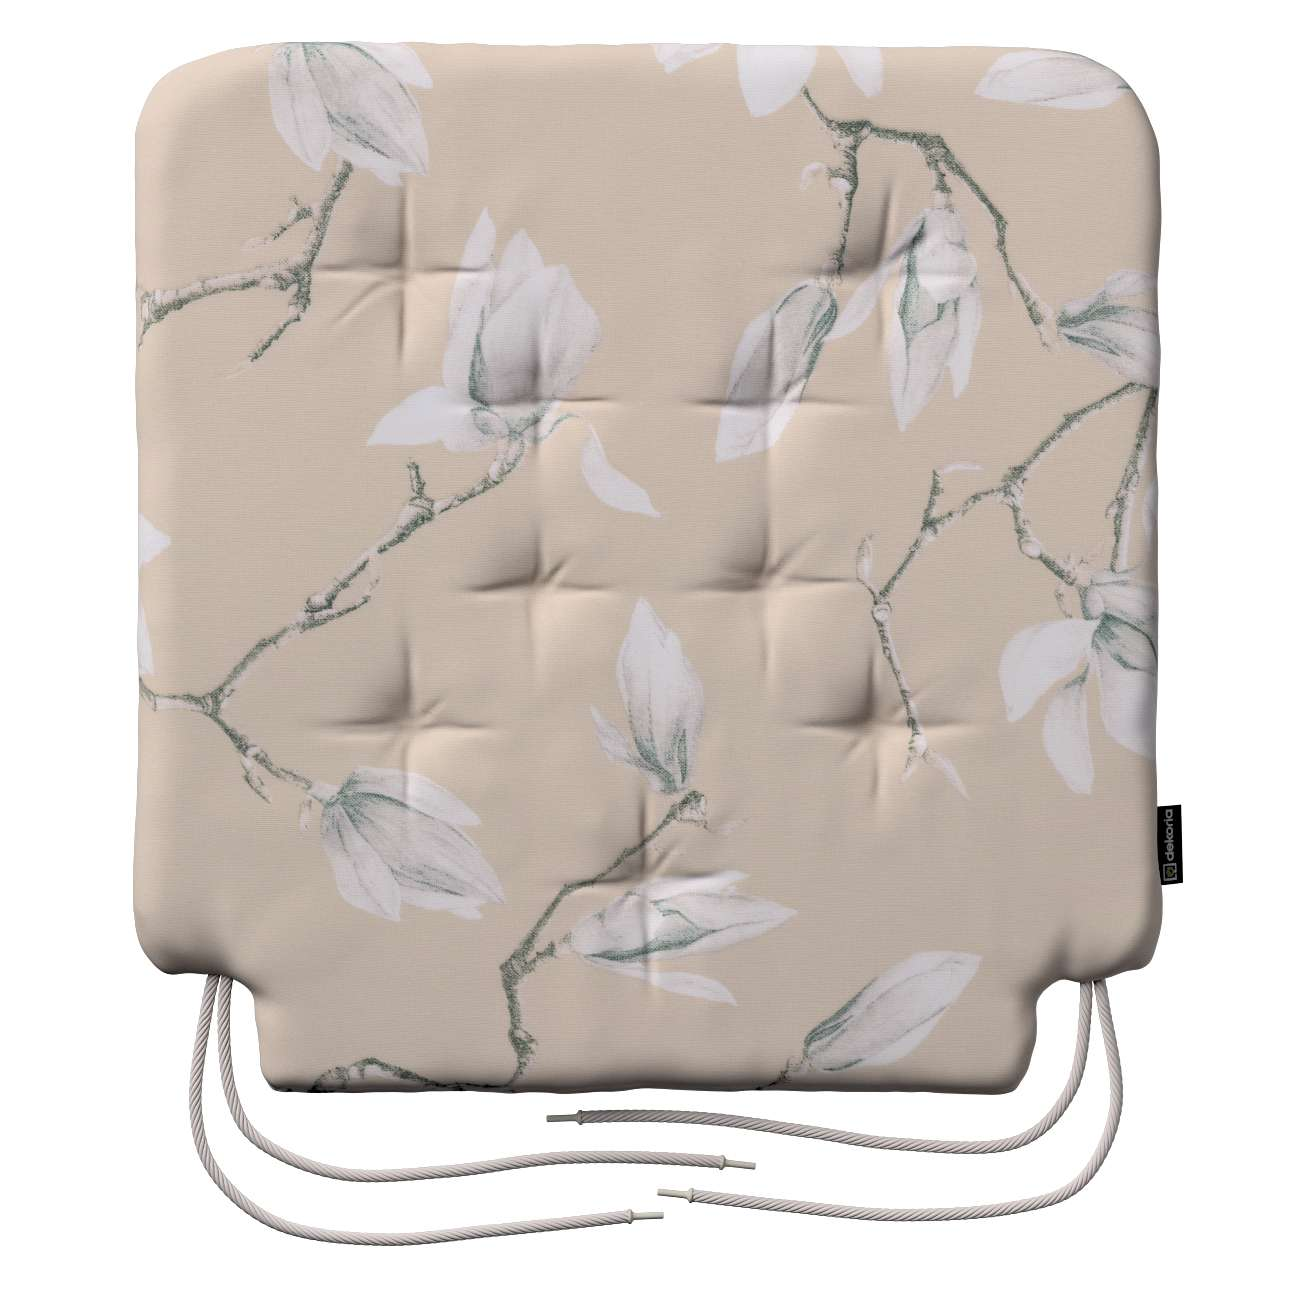 Kėdės pagalvėlė Olek  42 x 41 x 3,5 cm kolekcijoje Flowers, audinys: 311-12